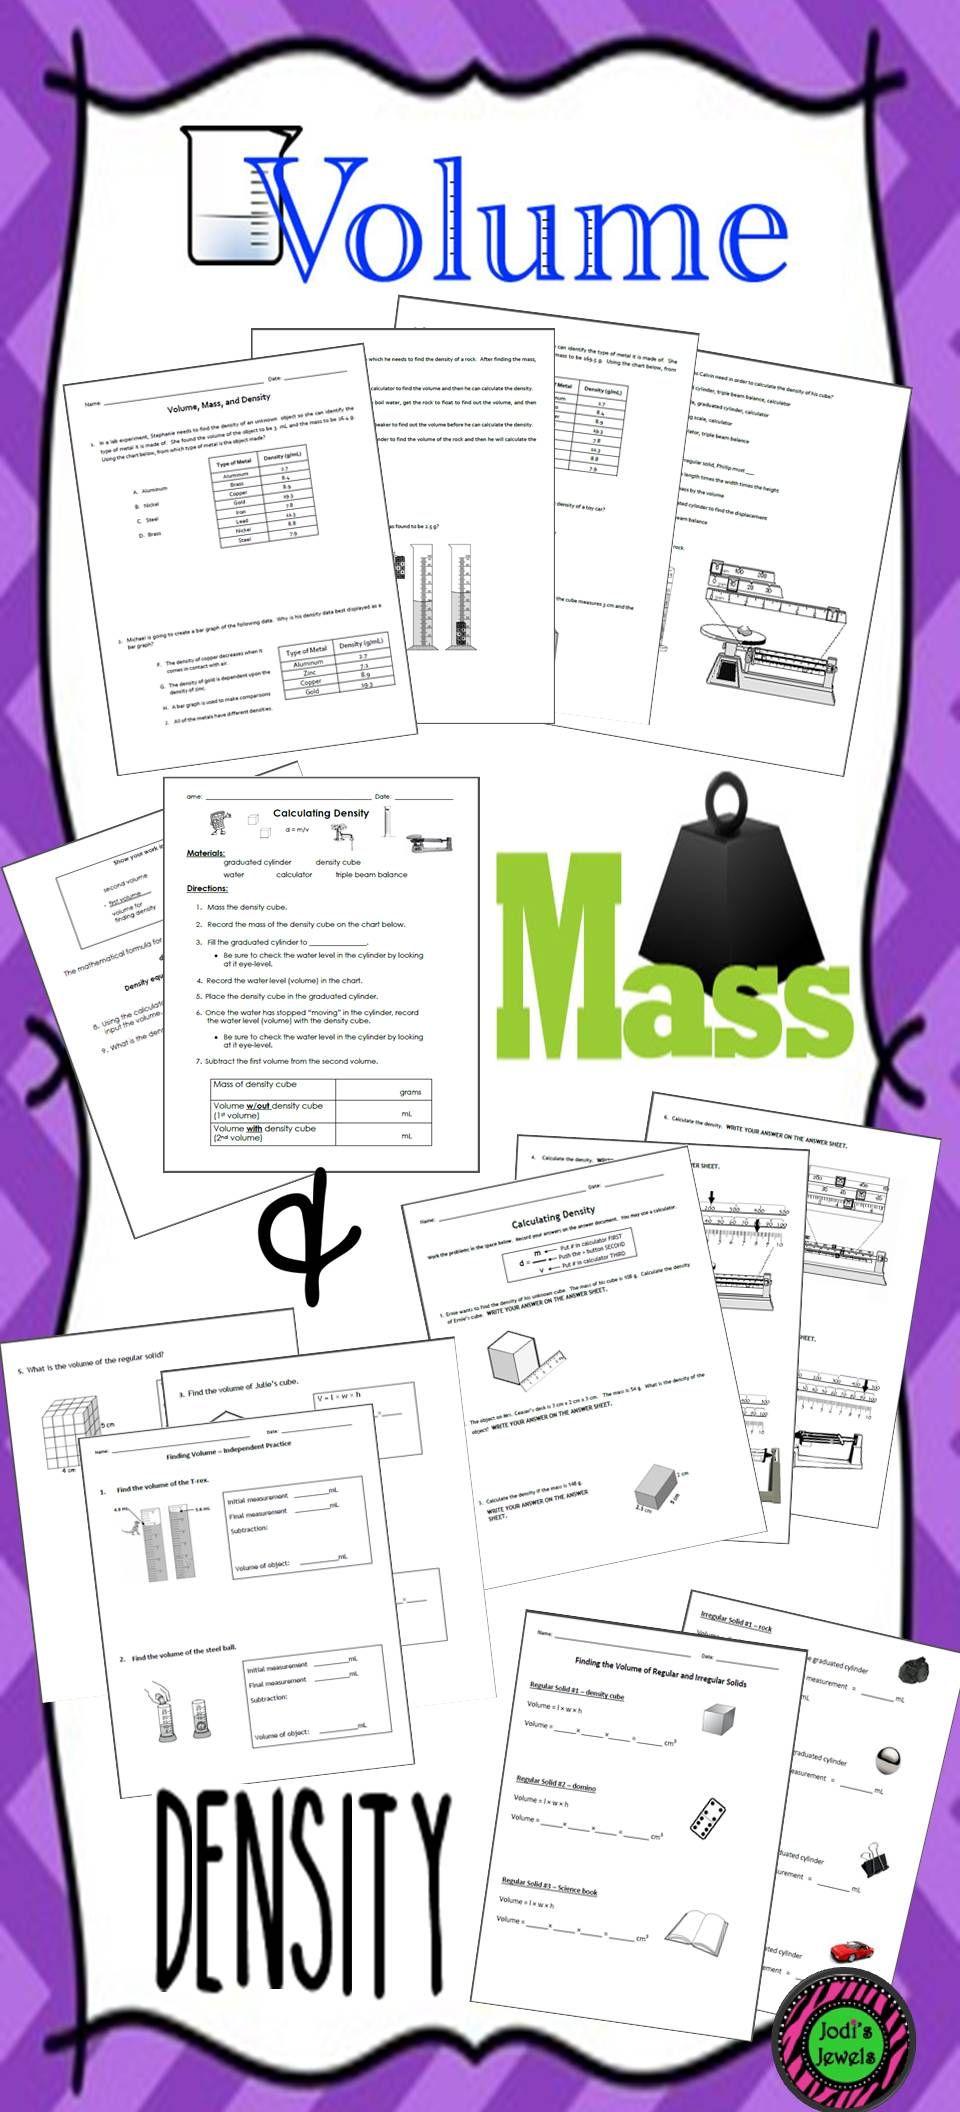 Volume, Mass, & Density lab sheets and worksheet practice